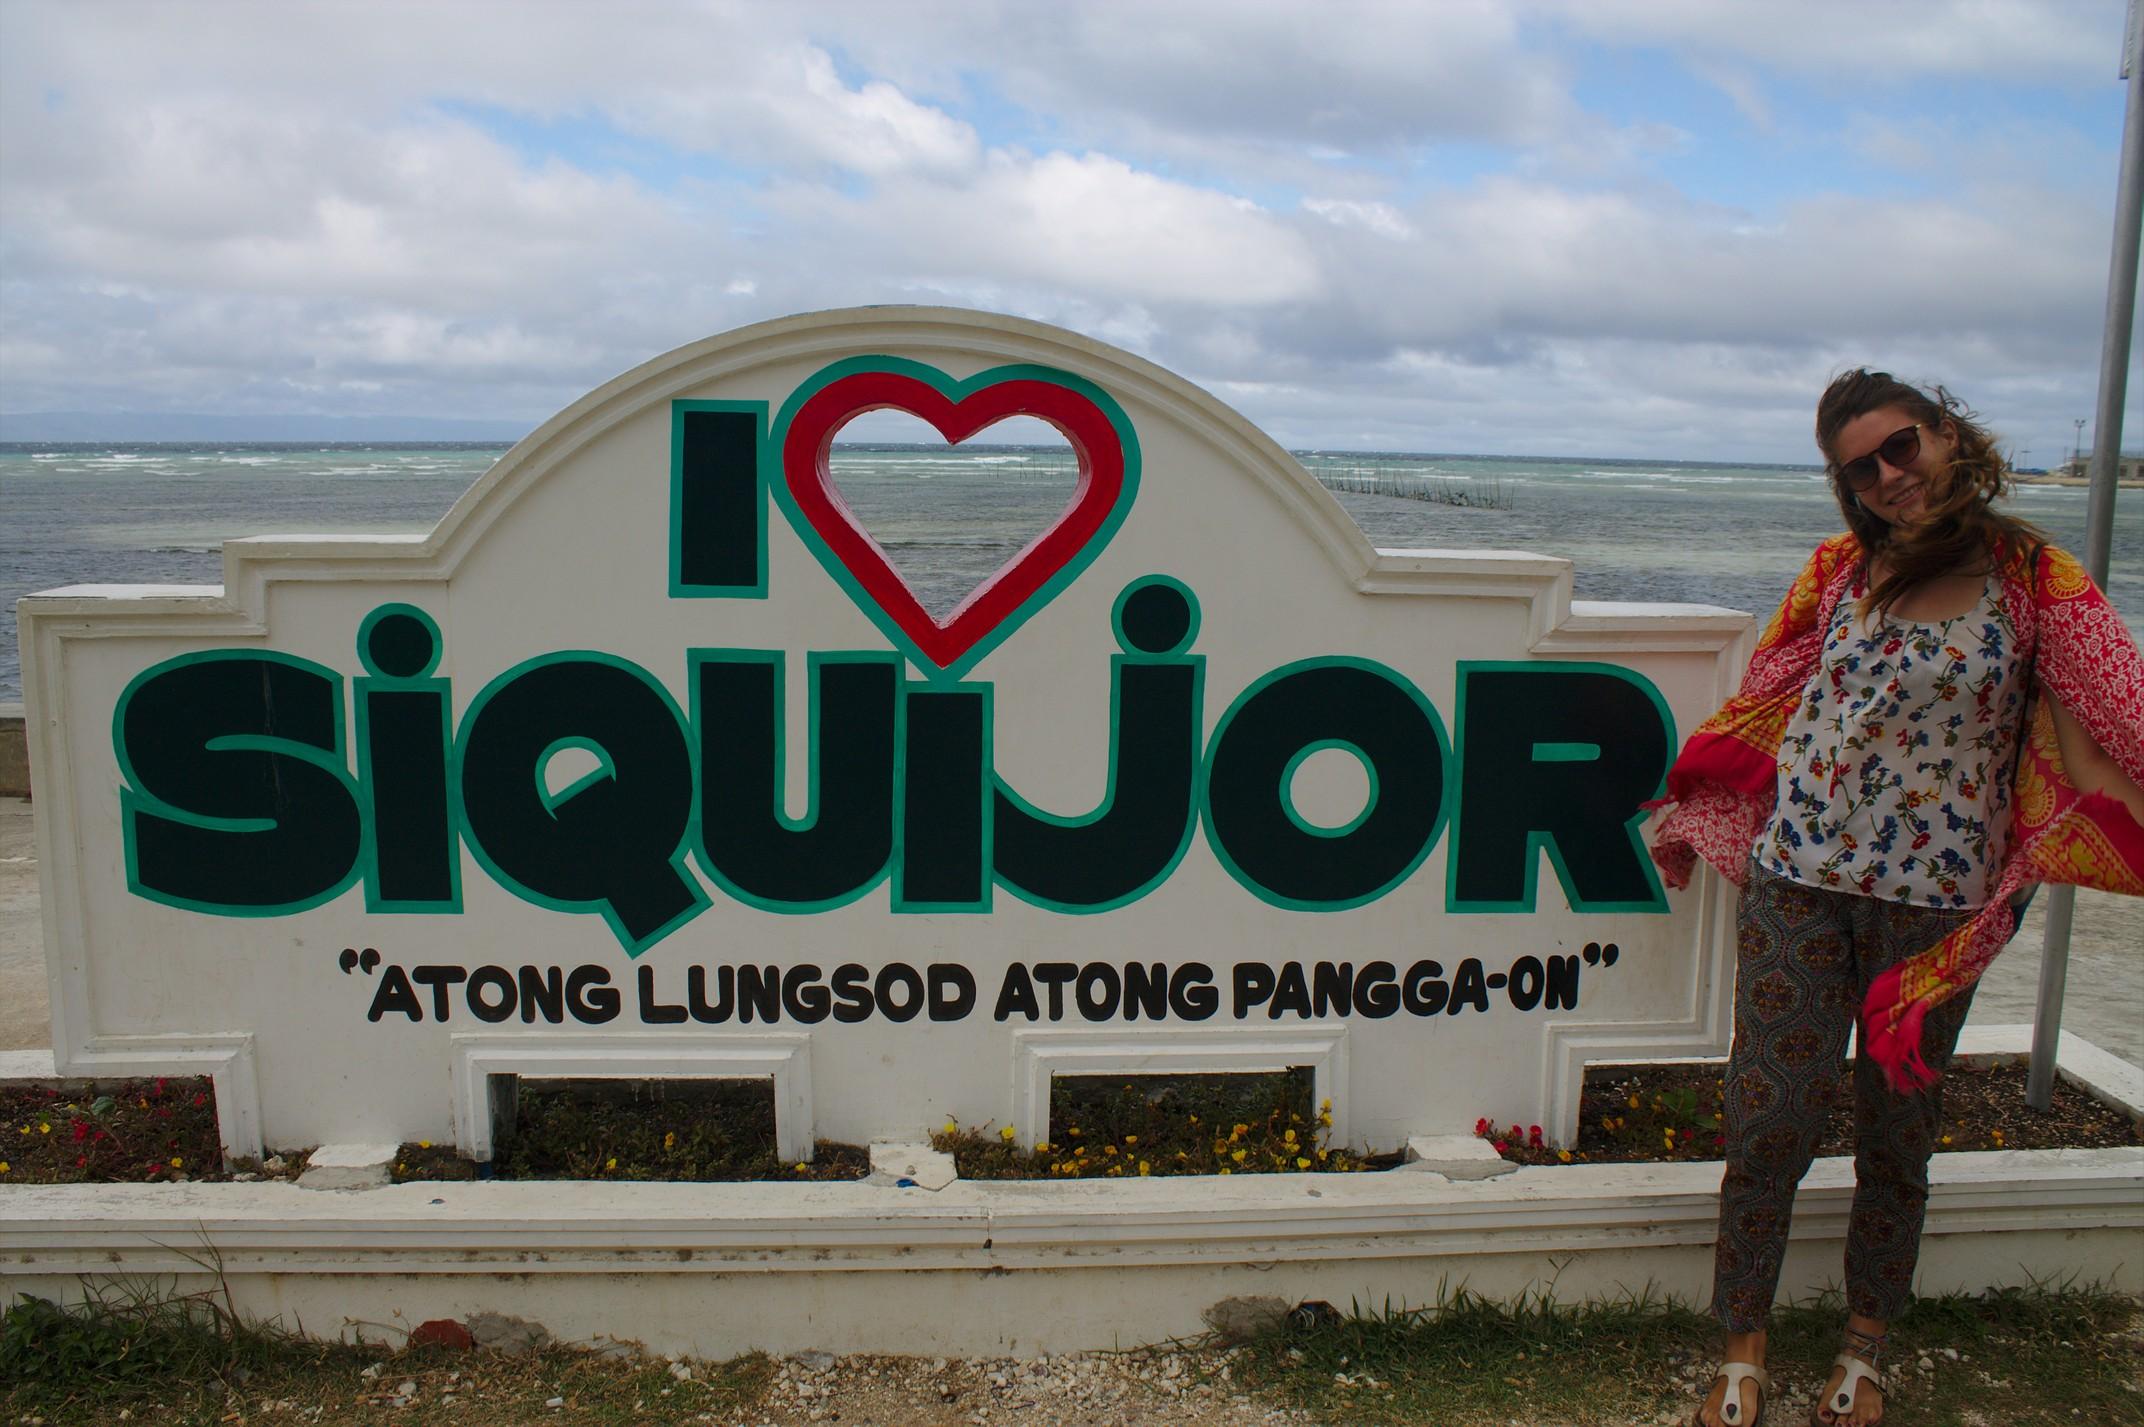 I Love Siquijor